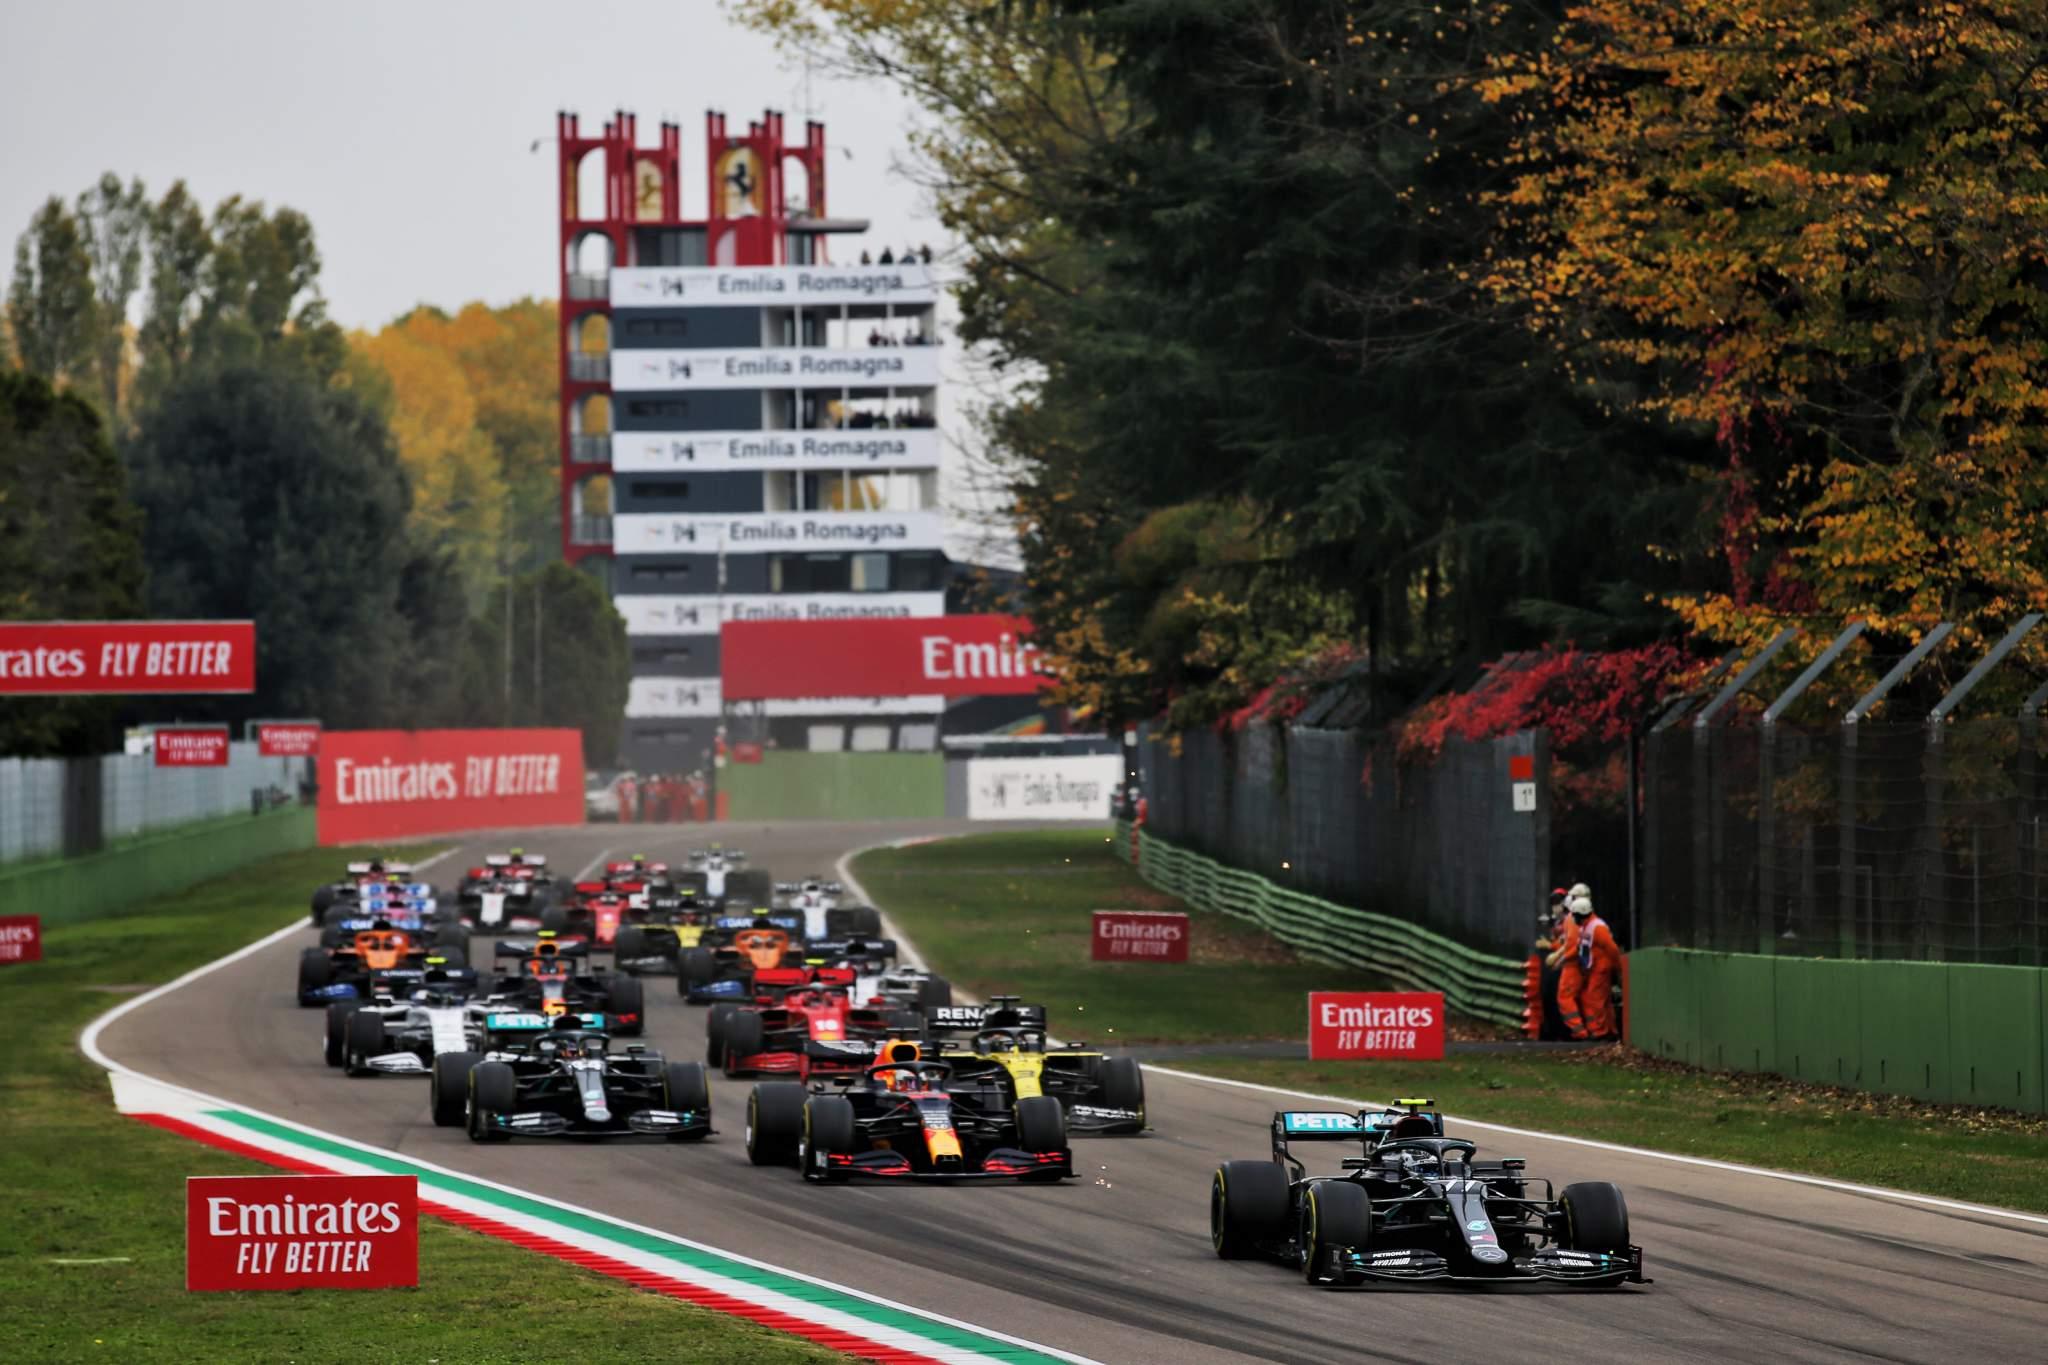 Imola F1